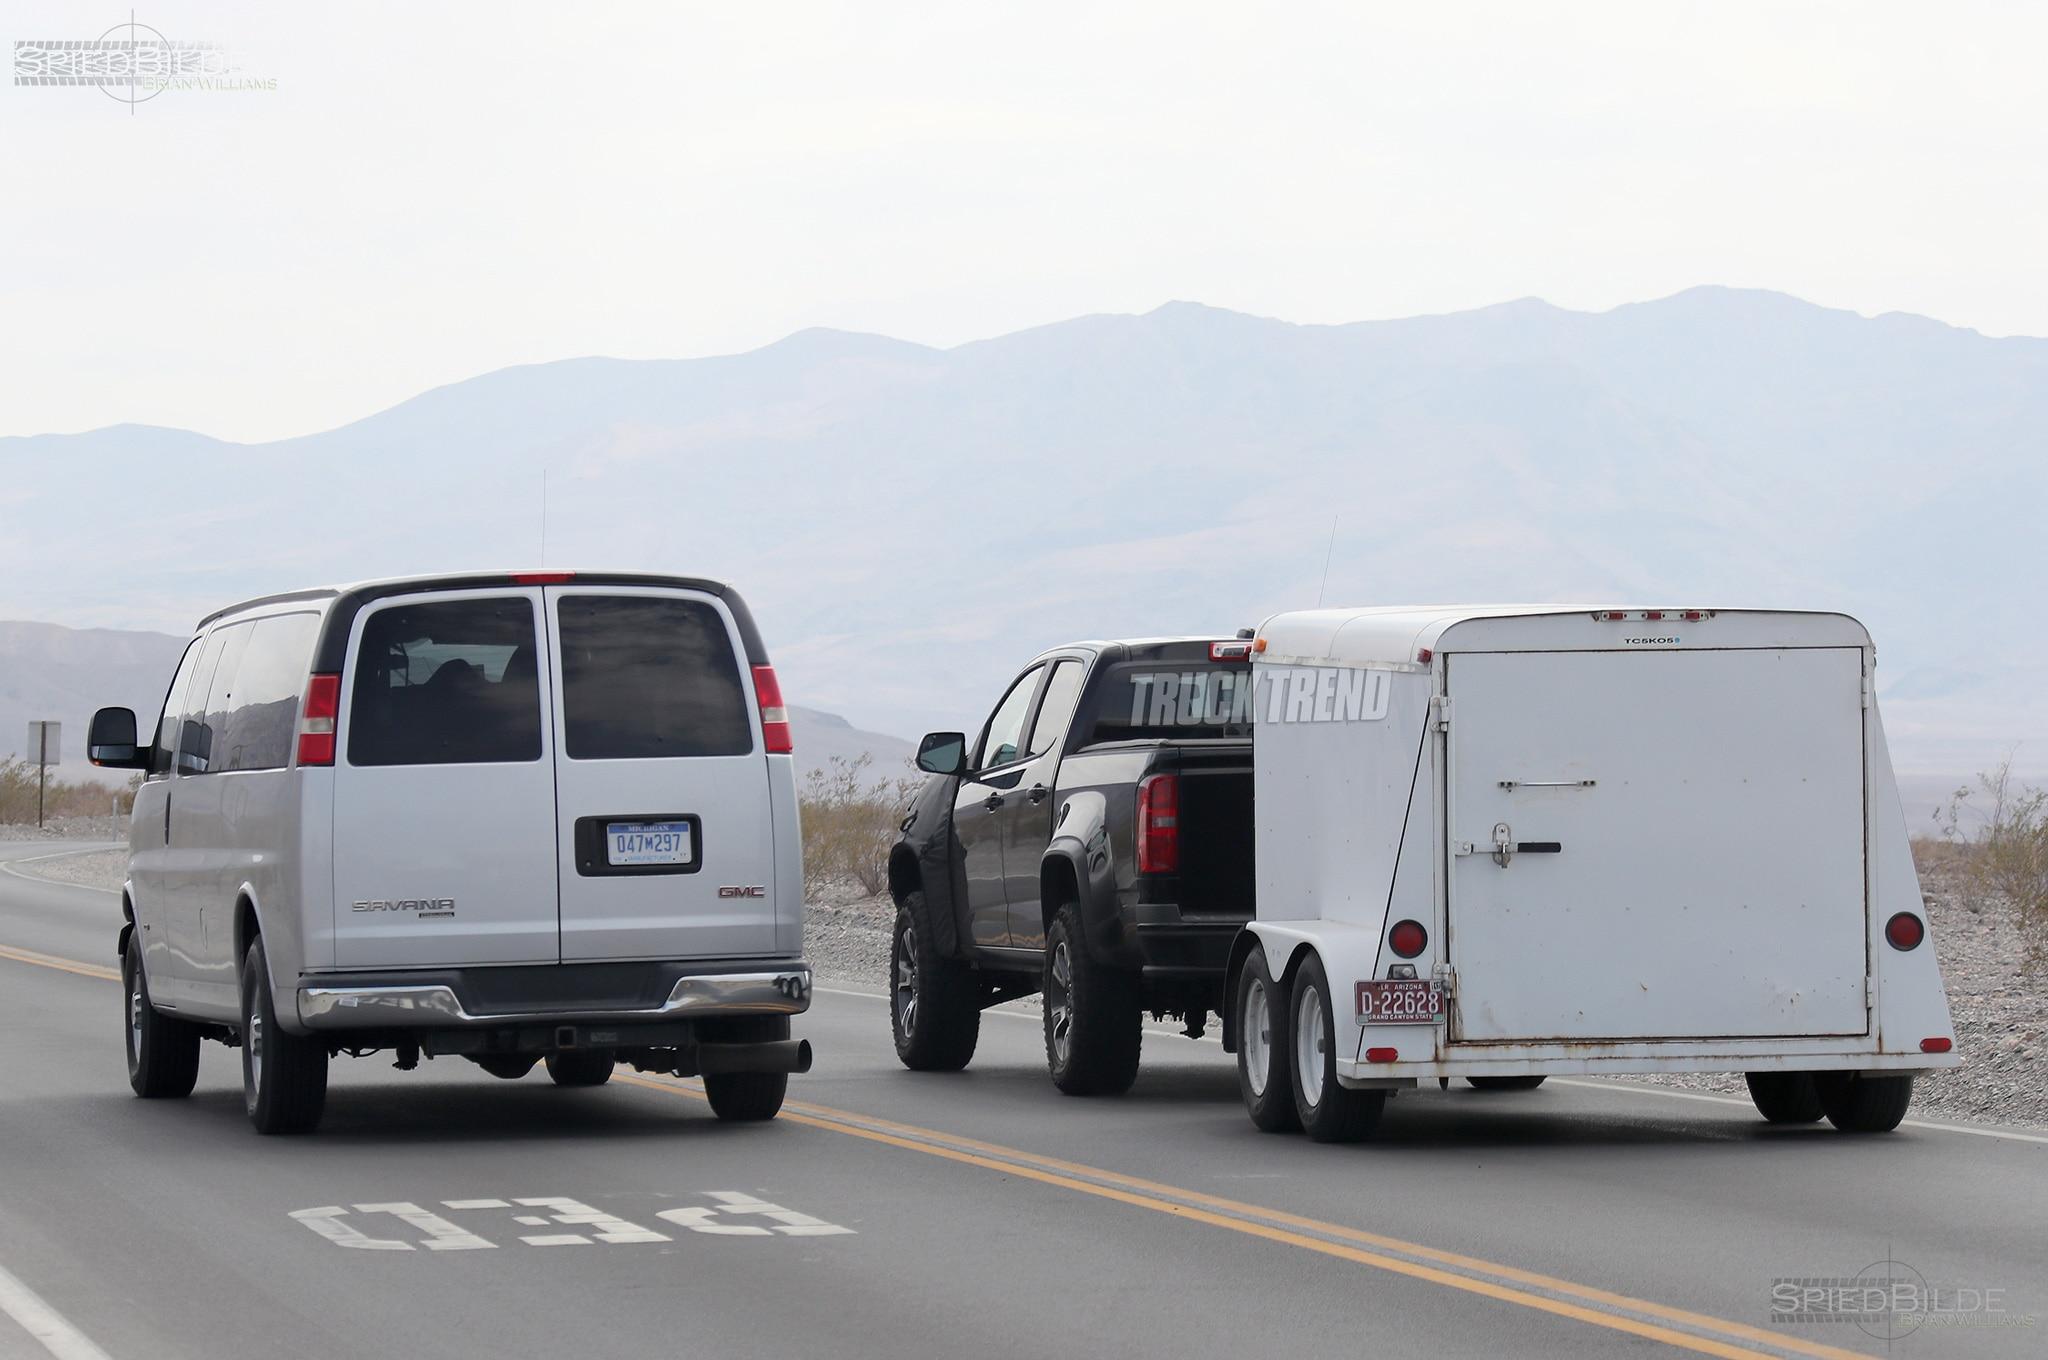 2018 chevrolet colorad zr2 towing with van